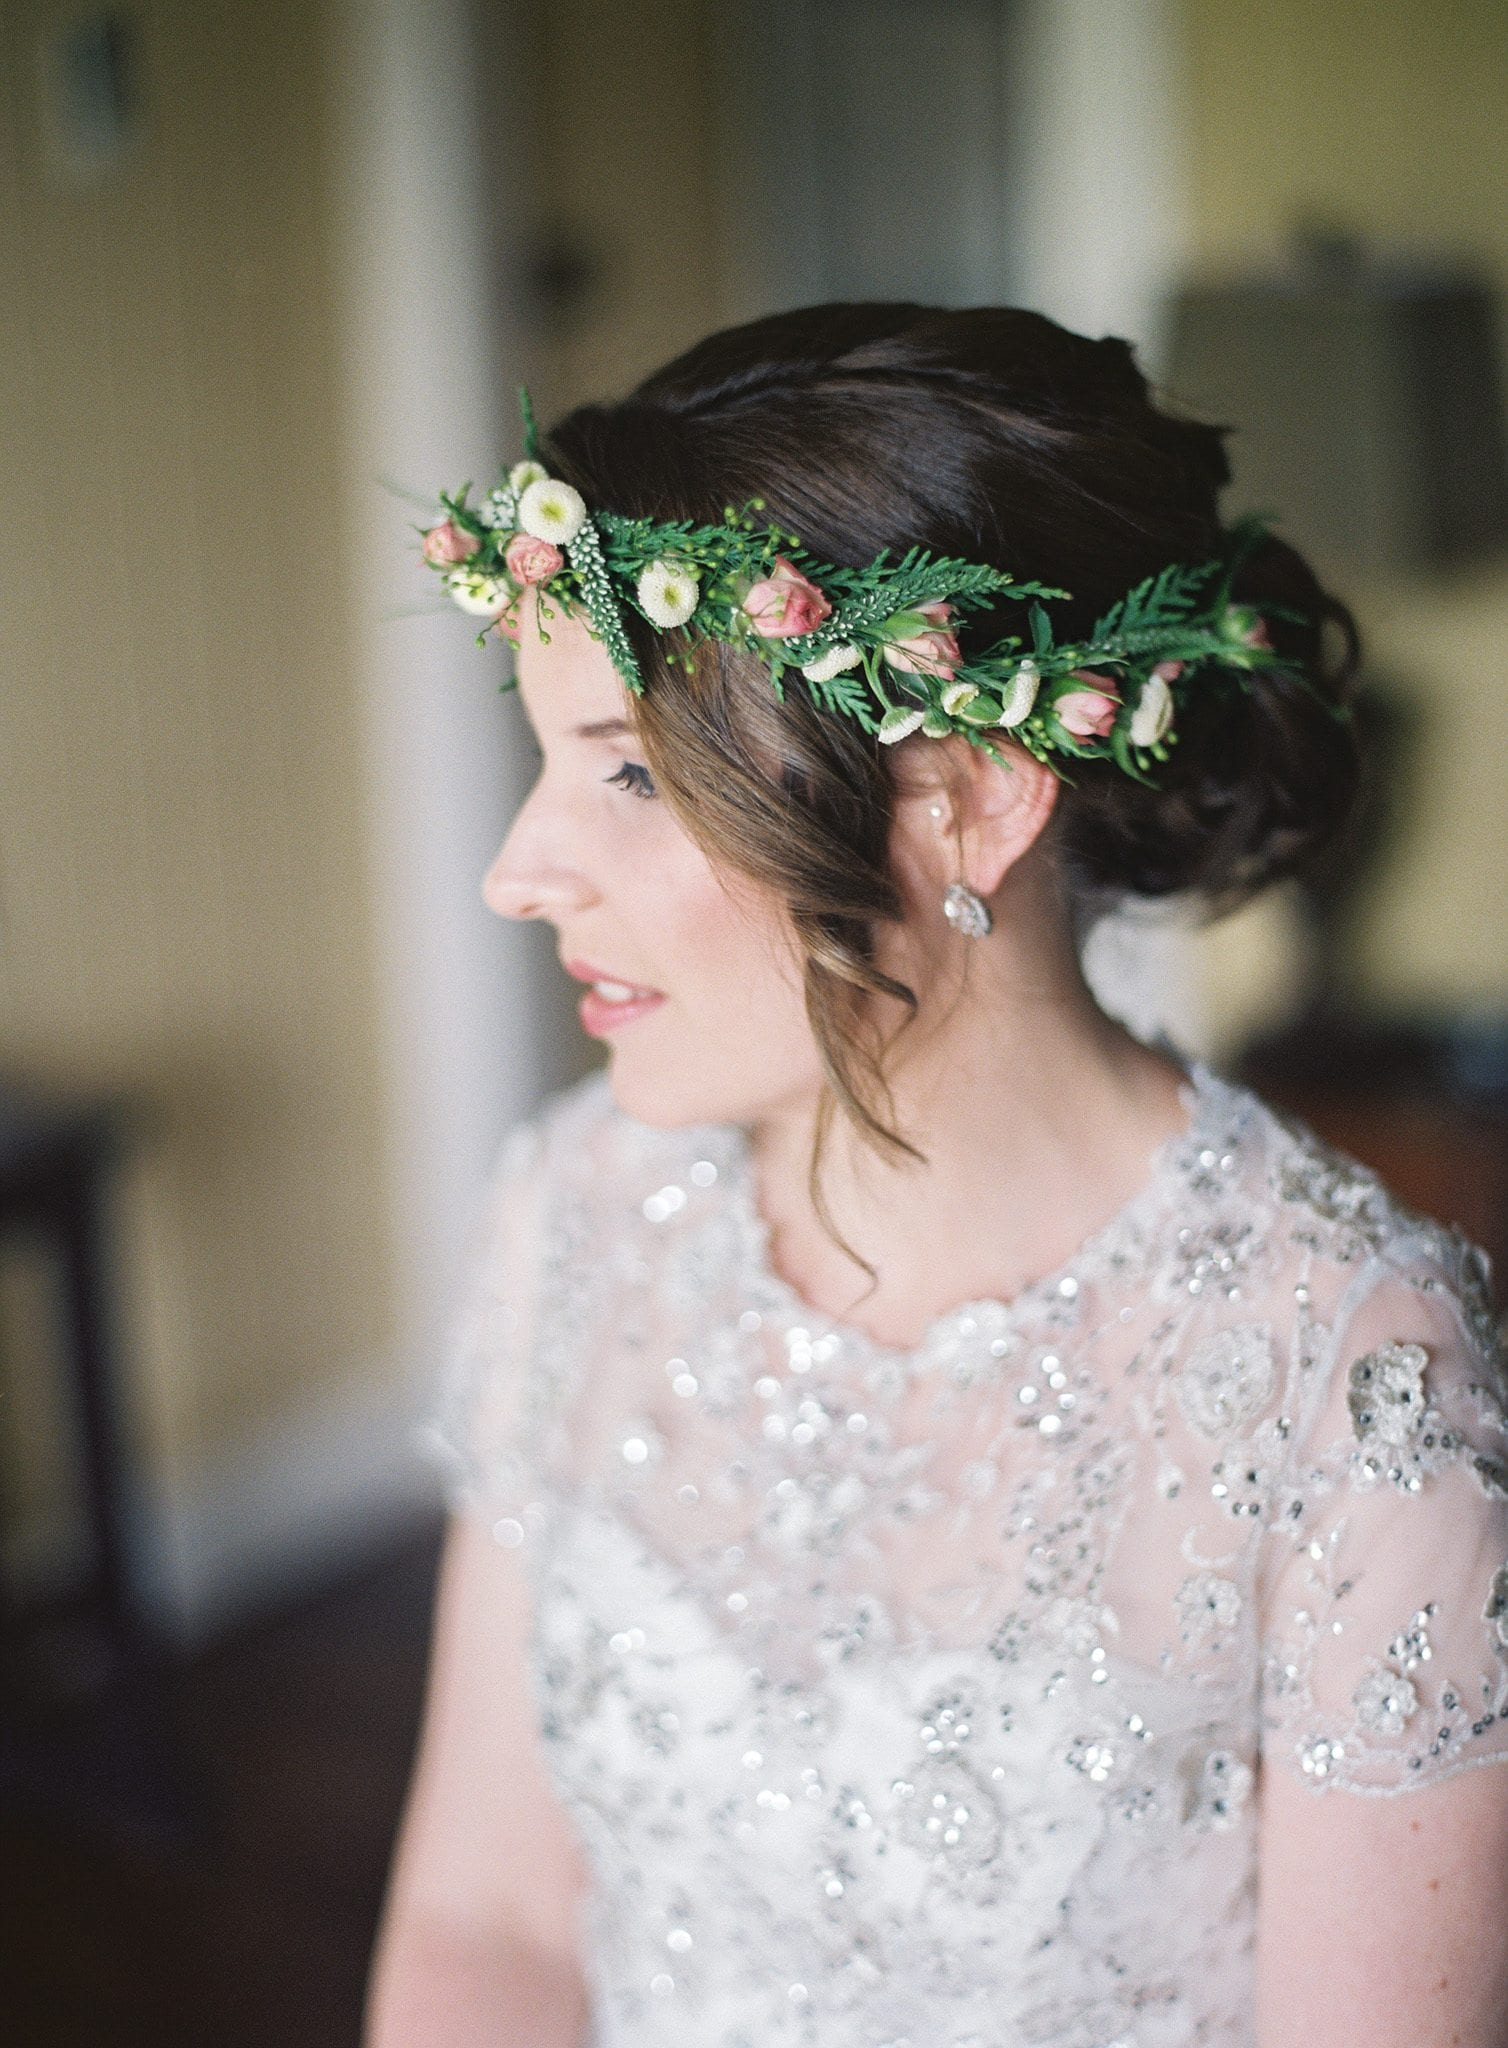 Gold Coast Weddings - Hair and Makeup Artist